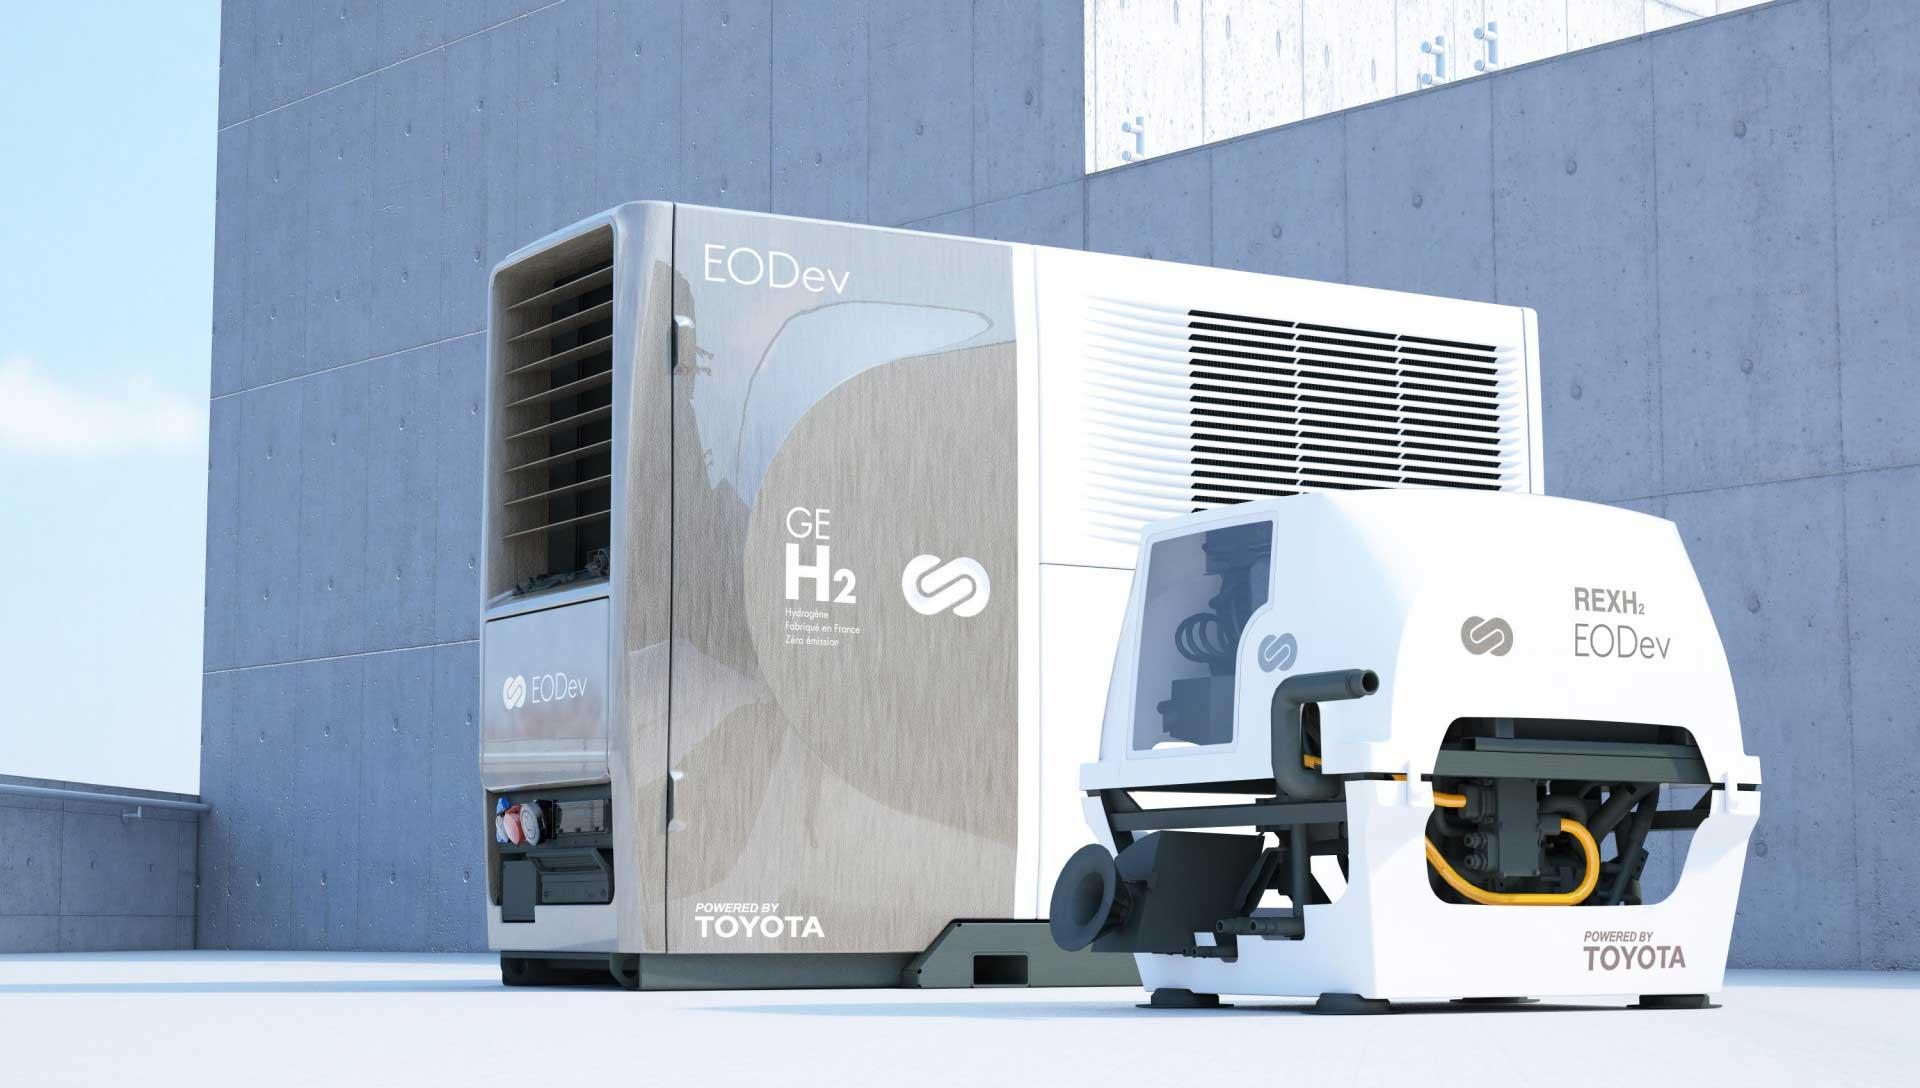 Hydrogène : Toyota investit dans la start-up EODev